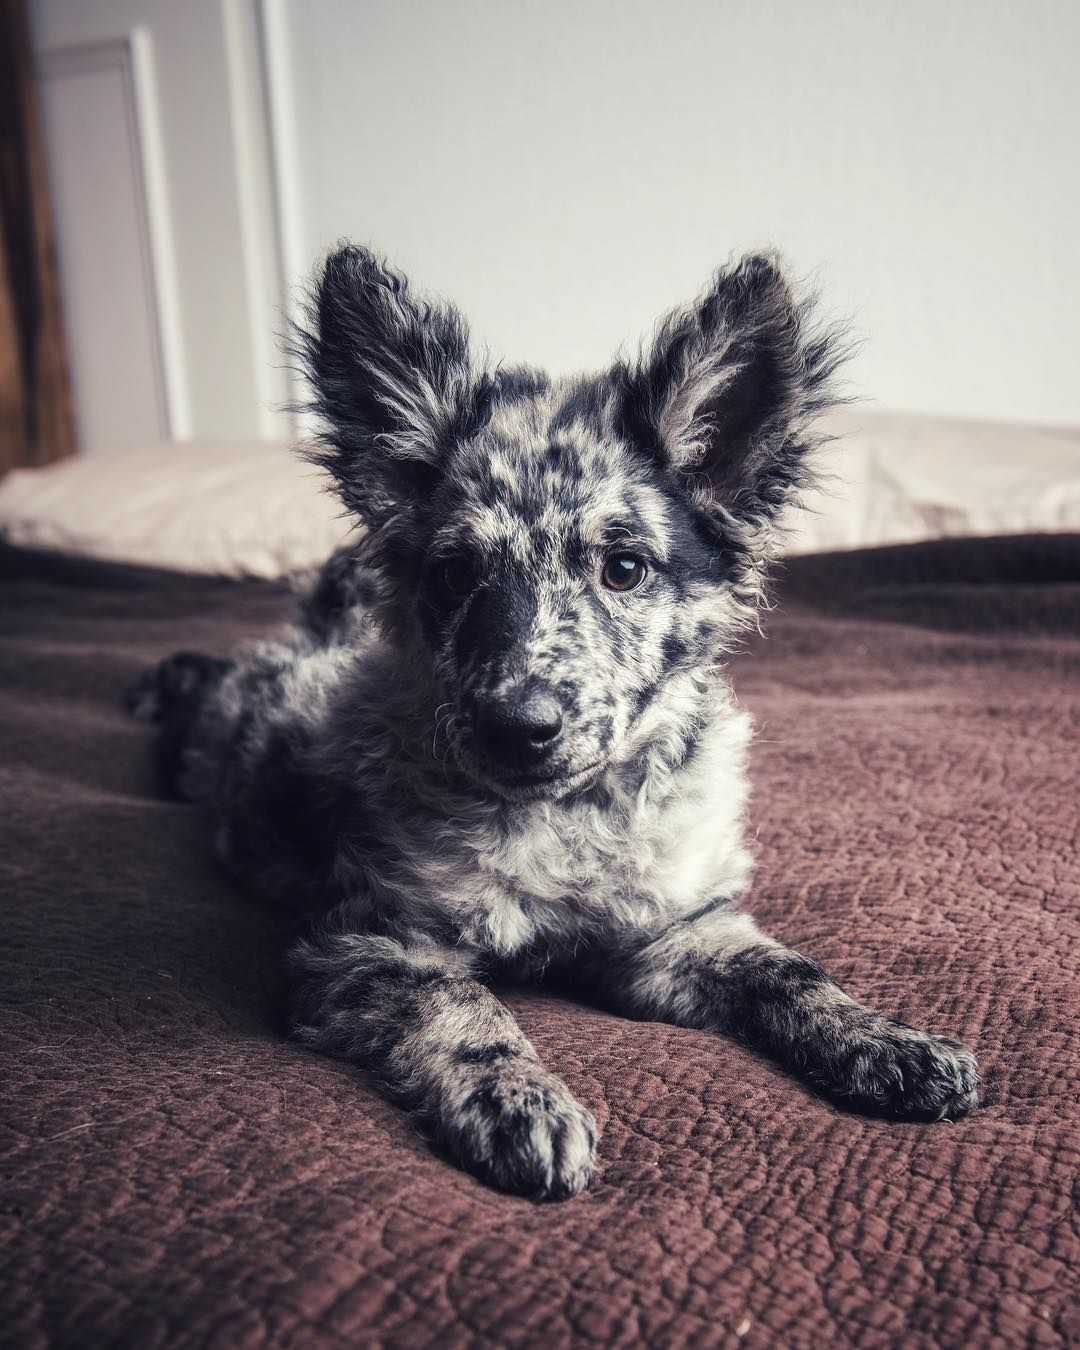 "Joe Barti on Instagram: ""#FBF to when my Mudi was a little more mini."" -  Hungarian Mudi Hungarian Mudi Hungarian Mudi Welcome to our website, We hope you are satisfied with - #barti #FBF #instagram #Joe #little #Mini #Mudi #Pets #Petsaccessories #Petsdiy #Petsdogs #Petsdogsaccessories #Petsdogsbreeds #Petsdogspuppies #Petsfish #Petsfunny #Petsideas #Petsquotes #Petsunique #smallPets #smallPetsforkids"